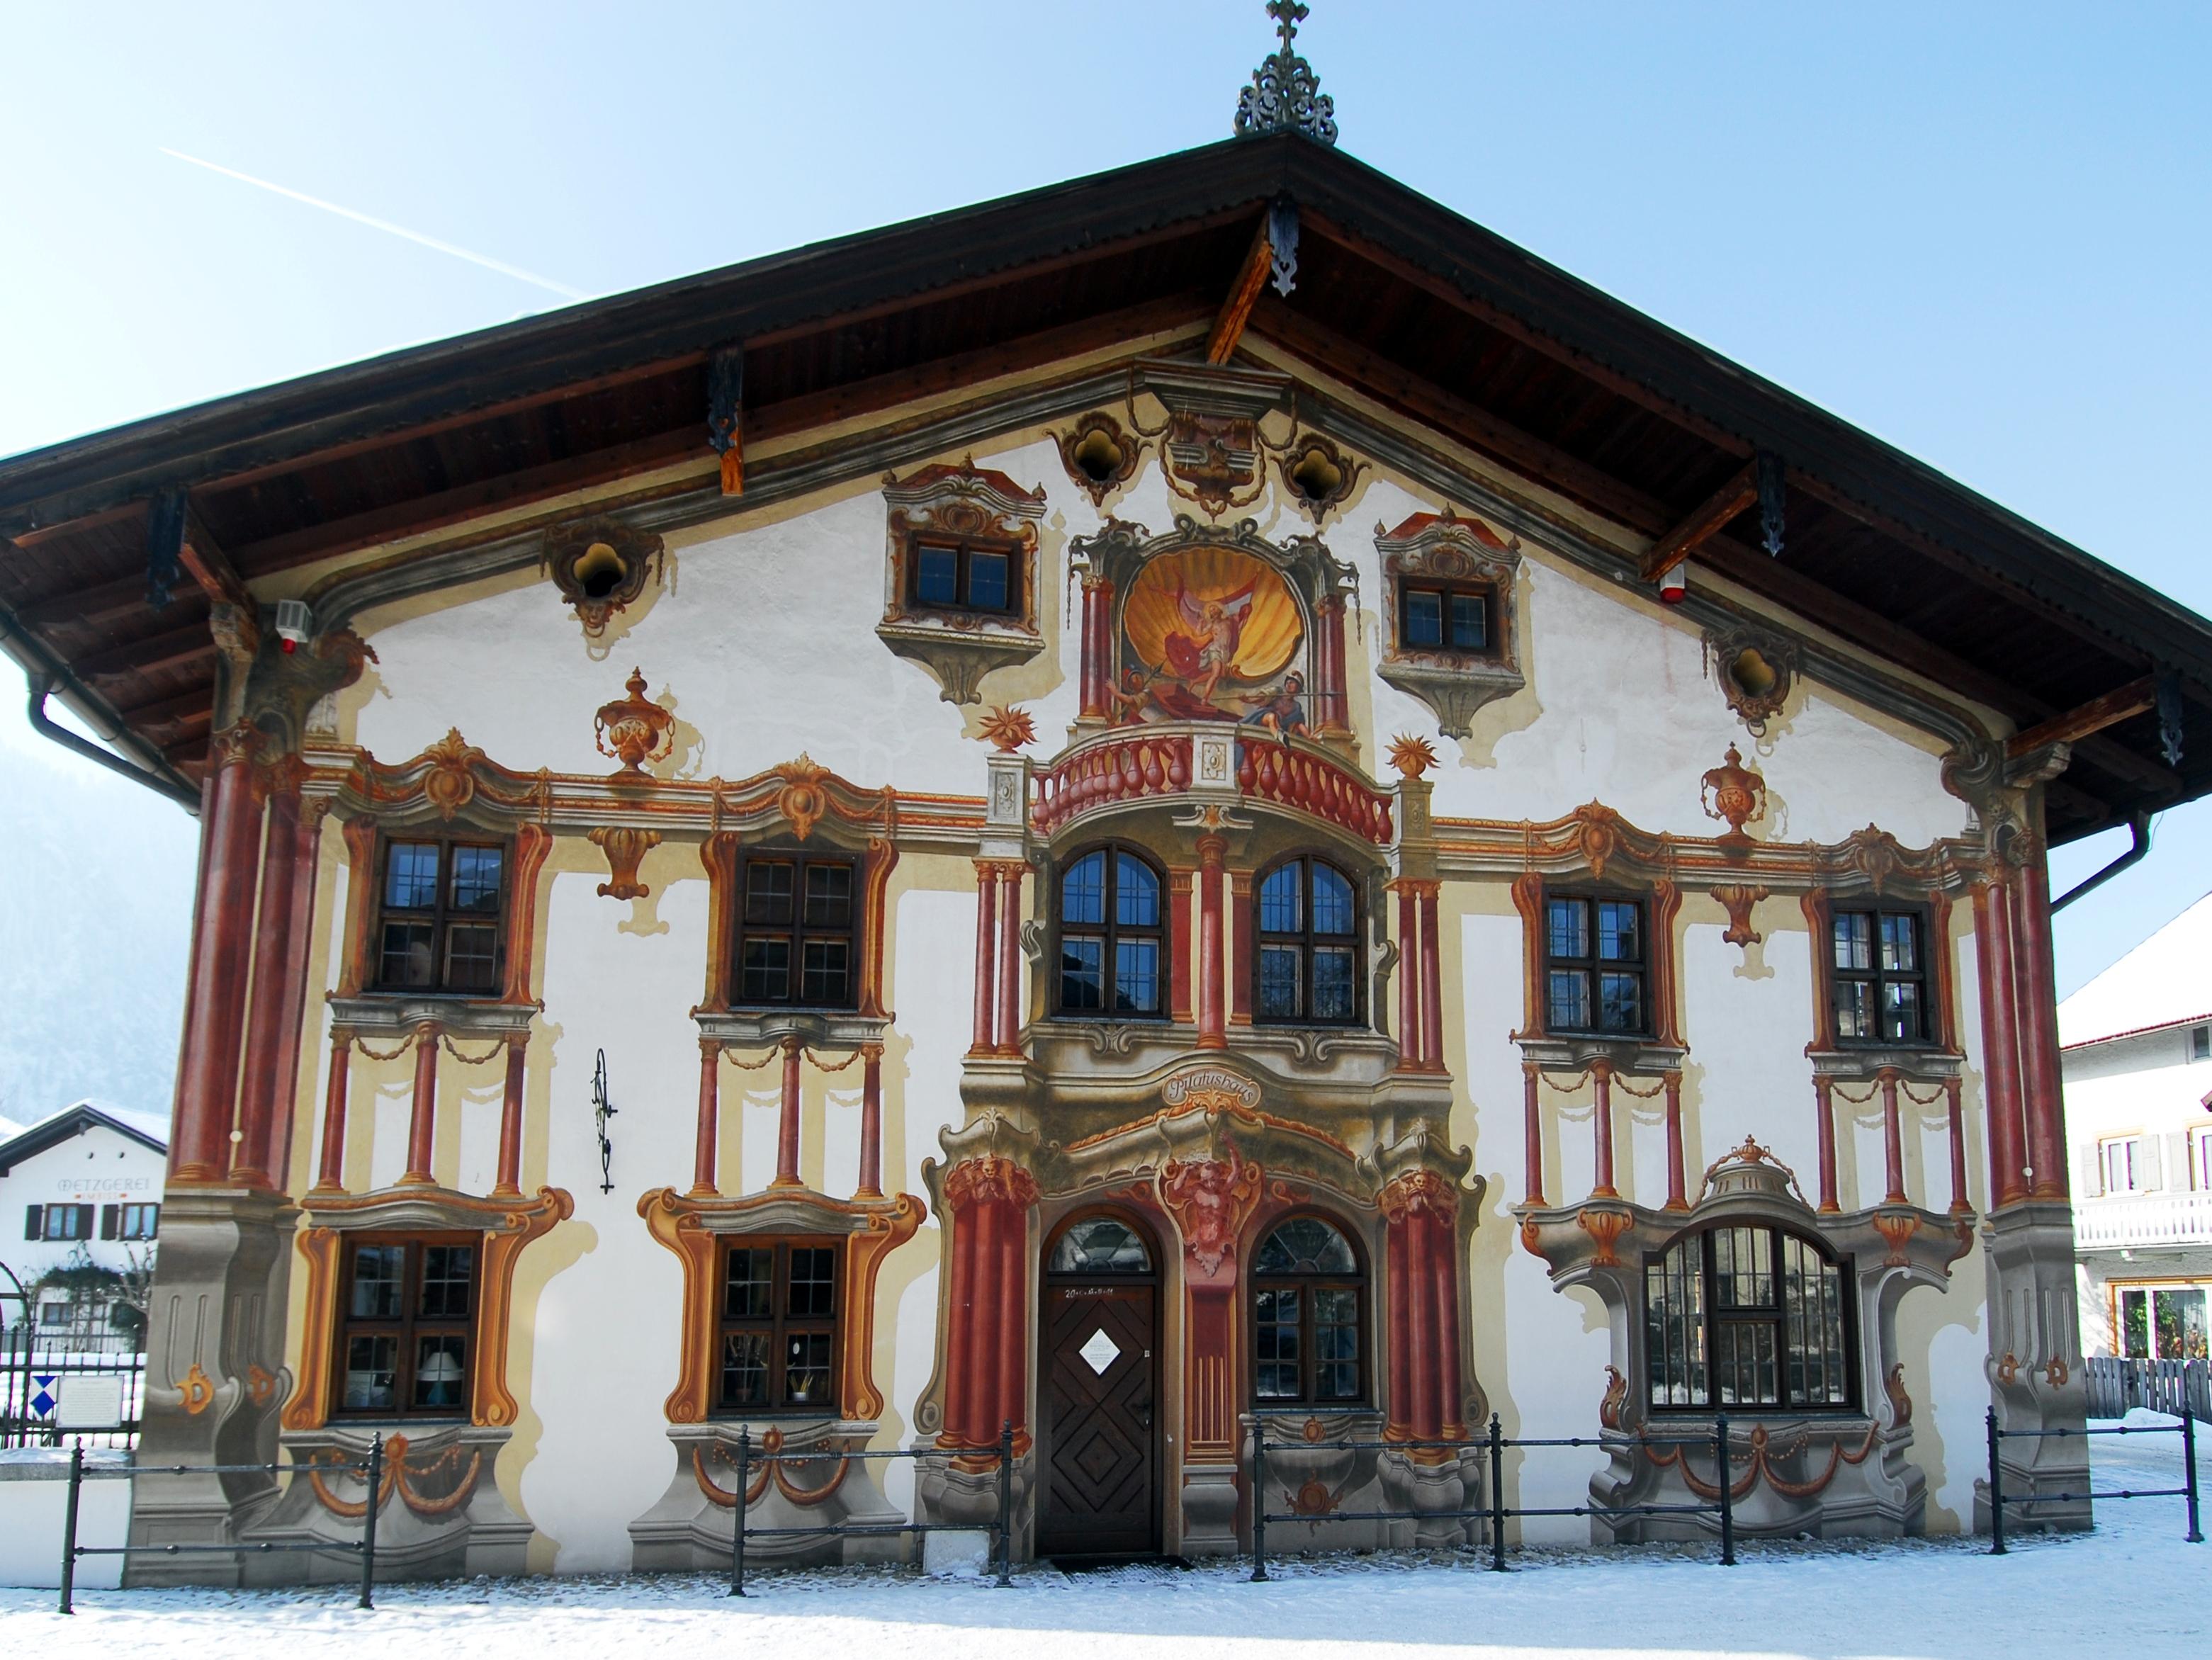 Pilatushaus in Oberammergau, Debionne